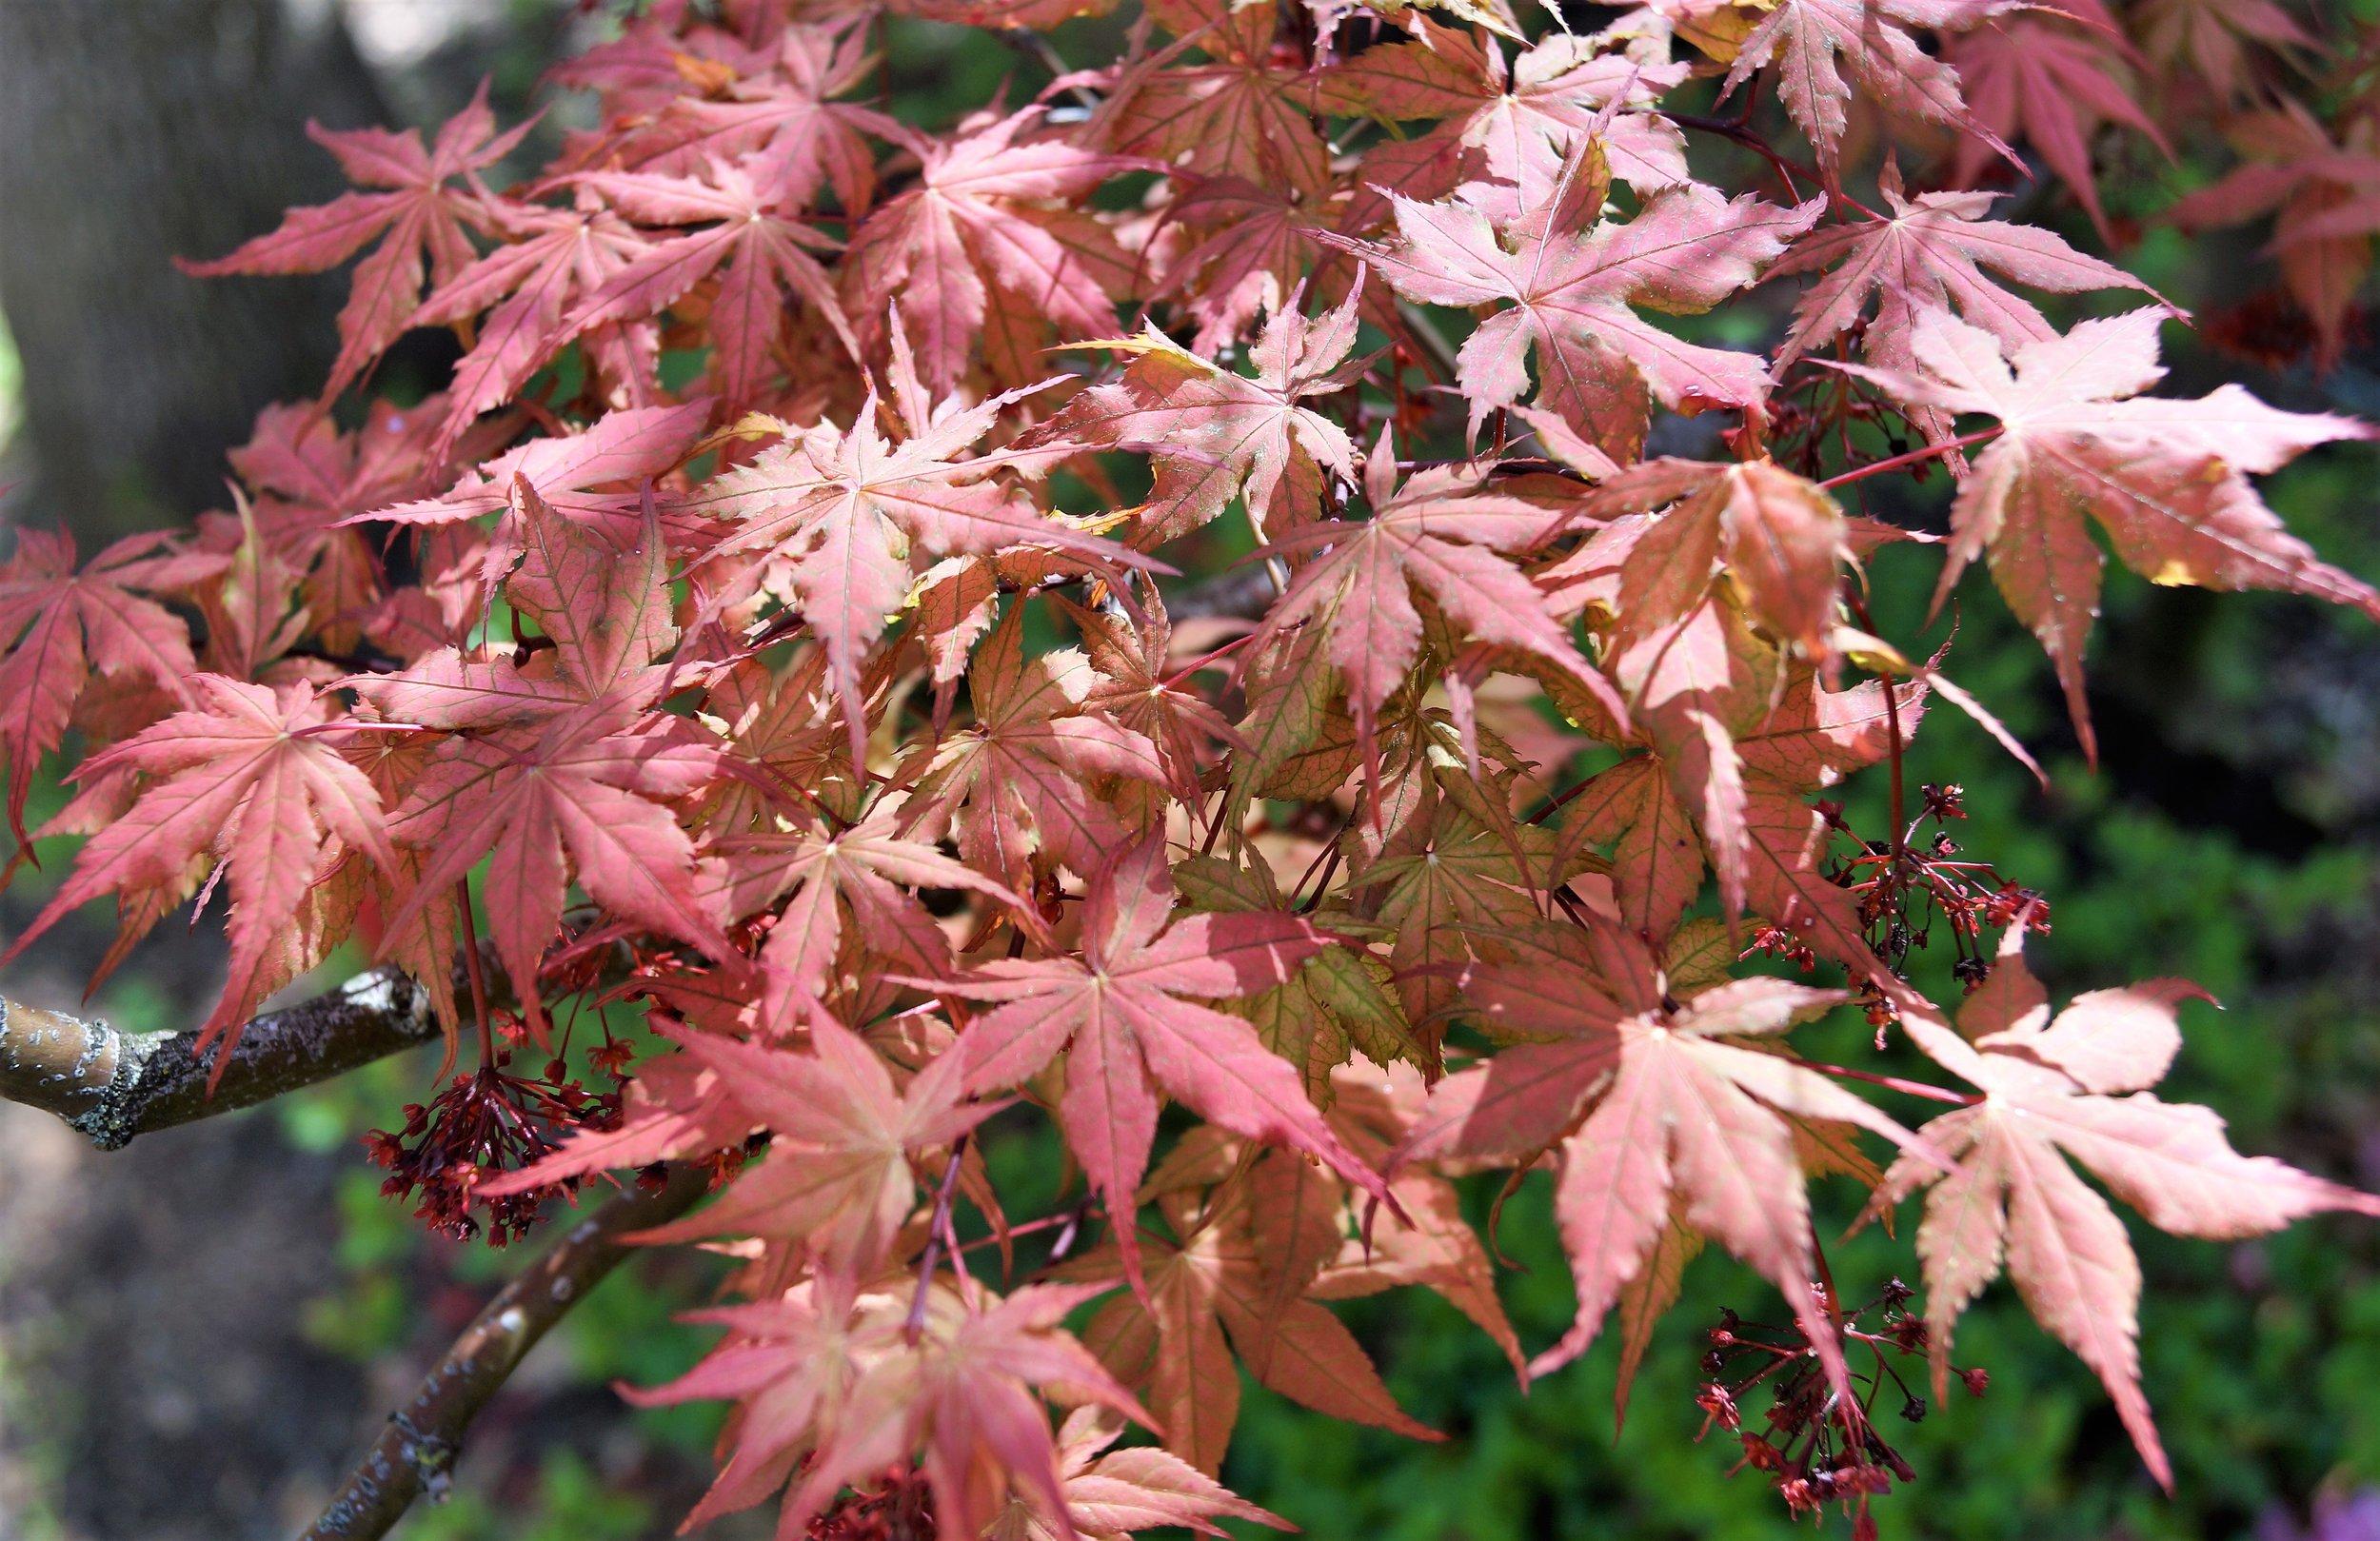 'Aka shigitatsu sawa' transitioning from spring to summer color.